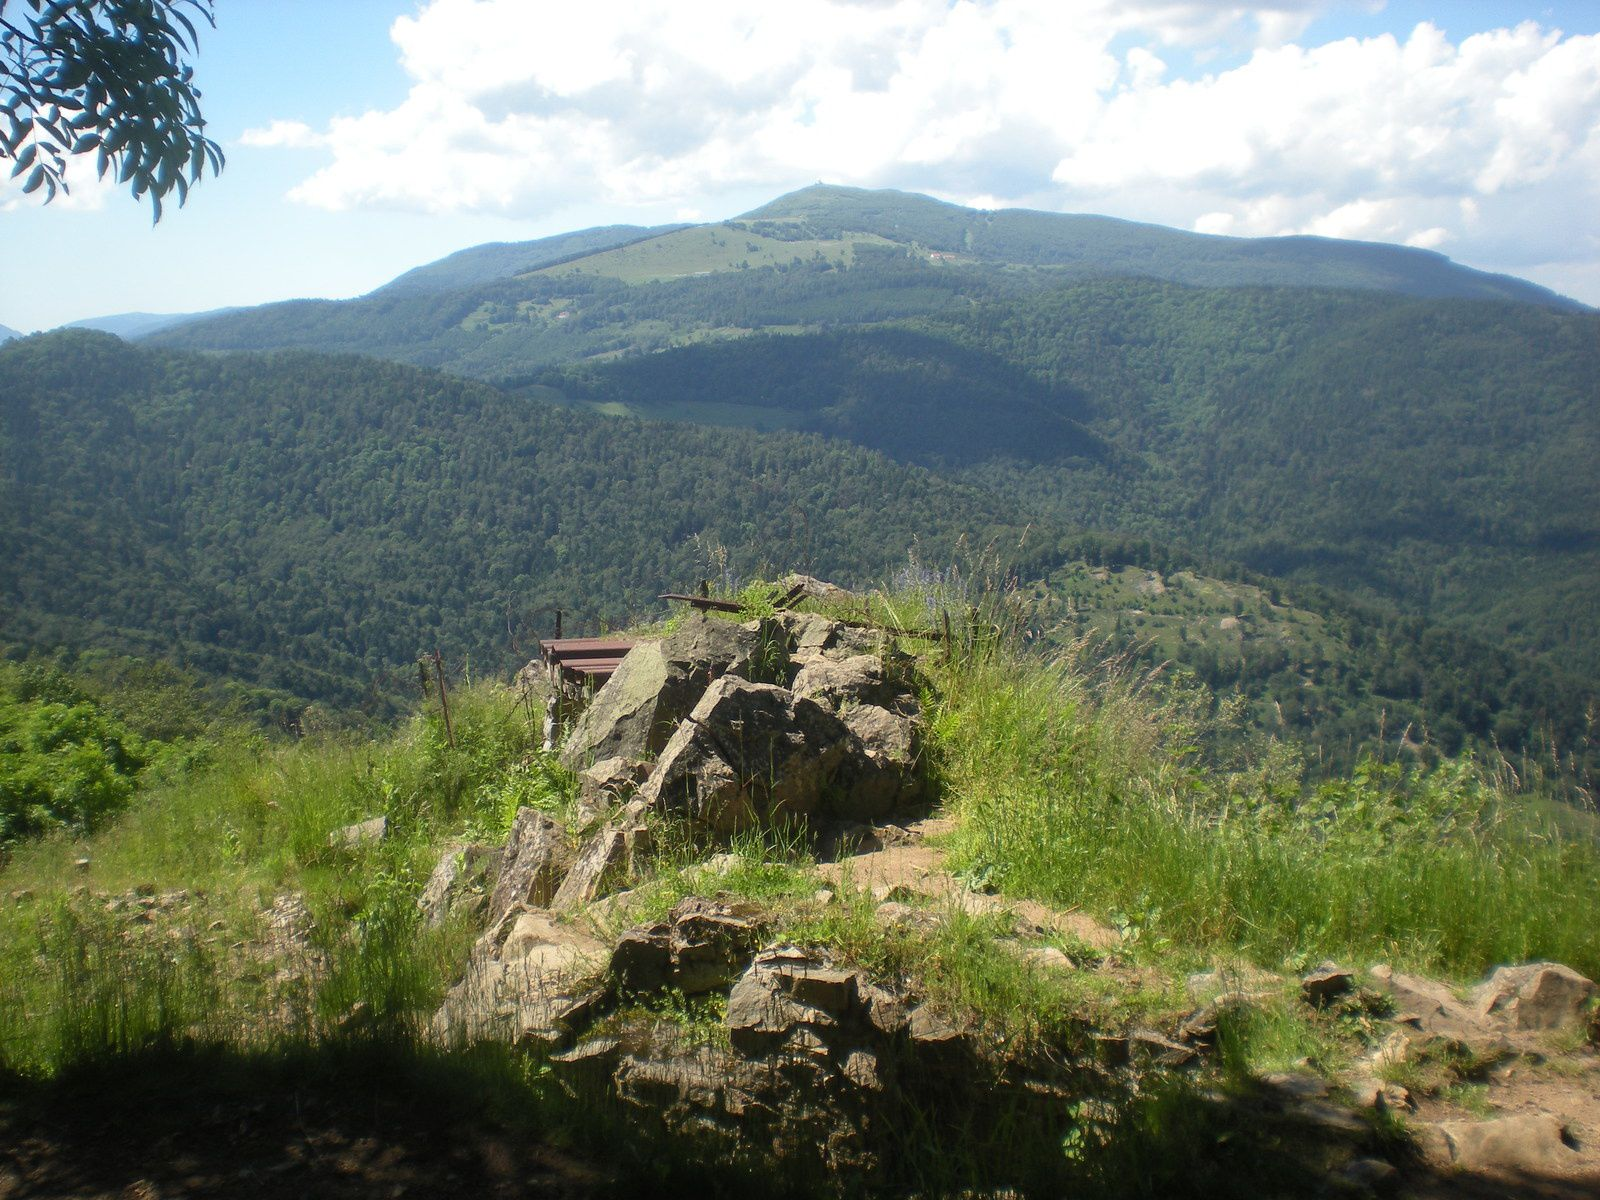 Mercredi 20 juillet - Randonnée au Hartmannswillerkopf